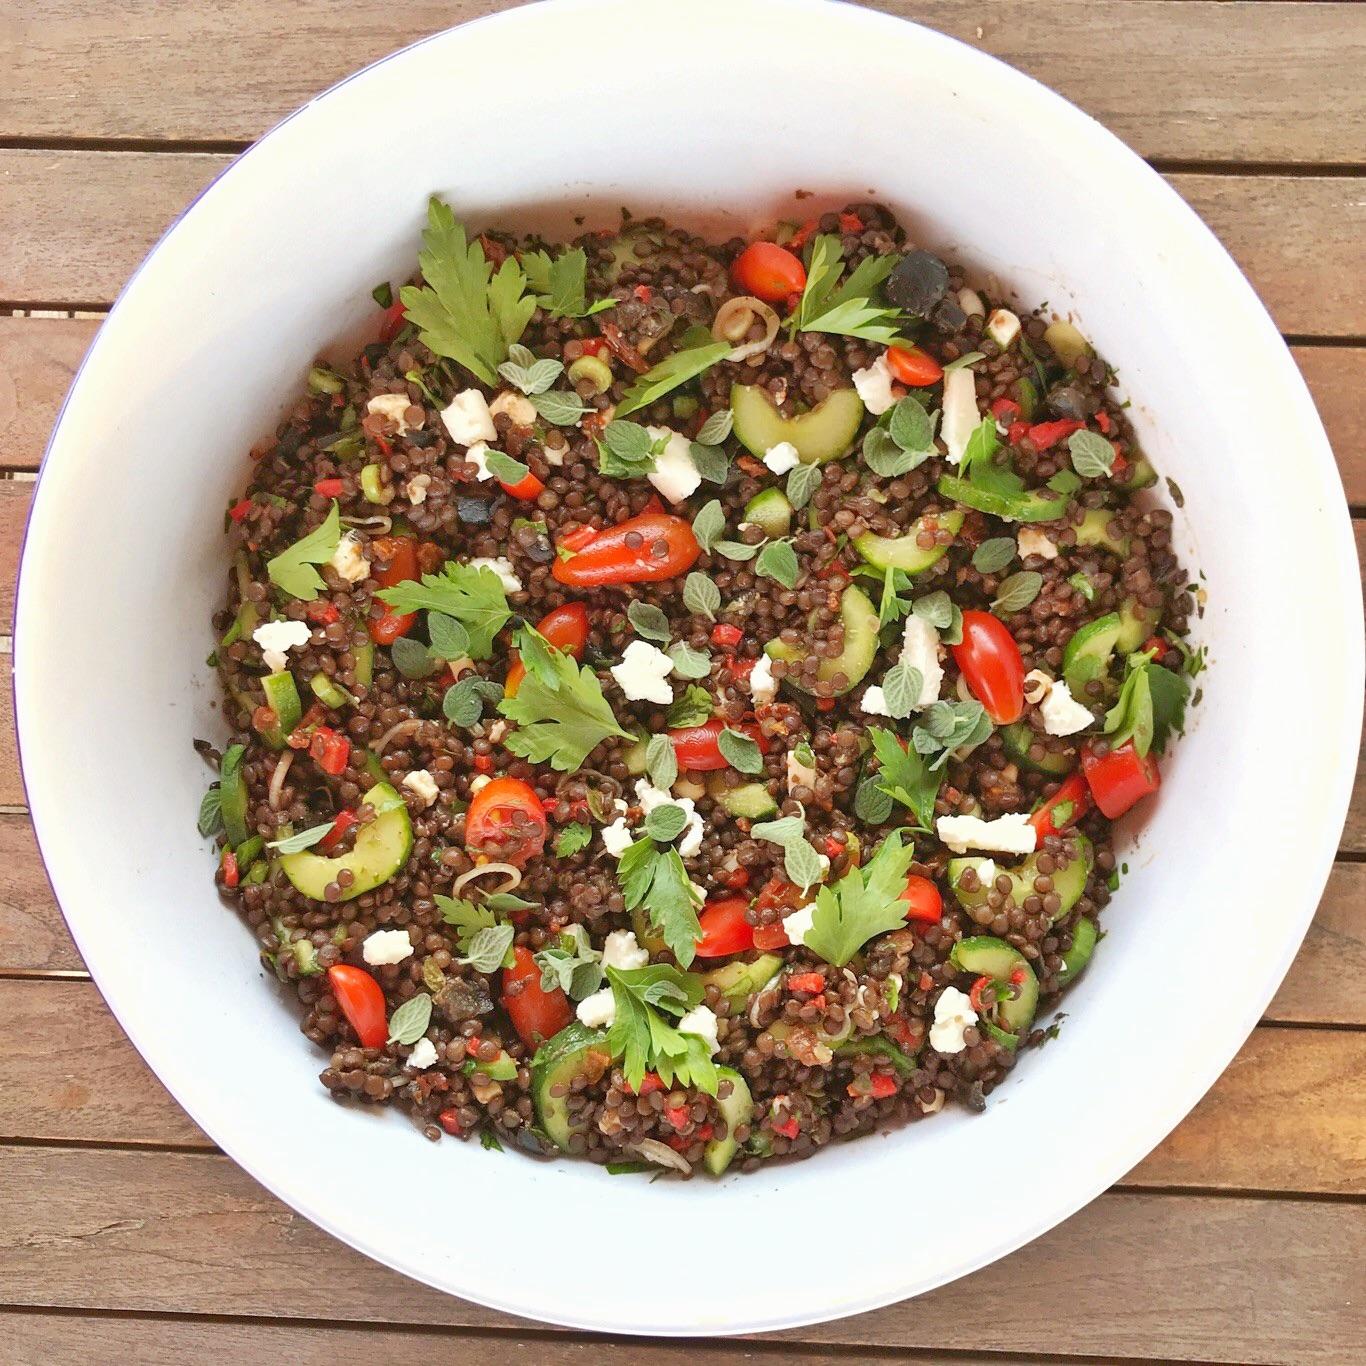 Beluga Lentils Salad Frixos Personal Chefing